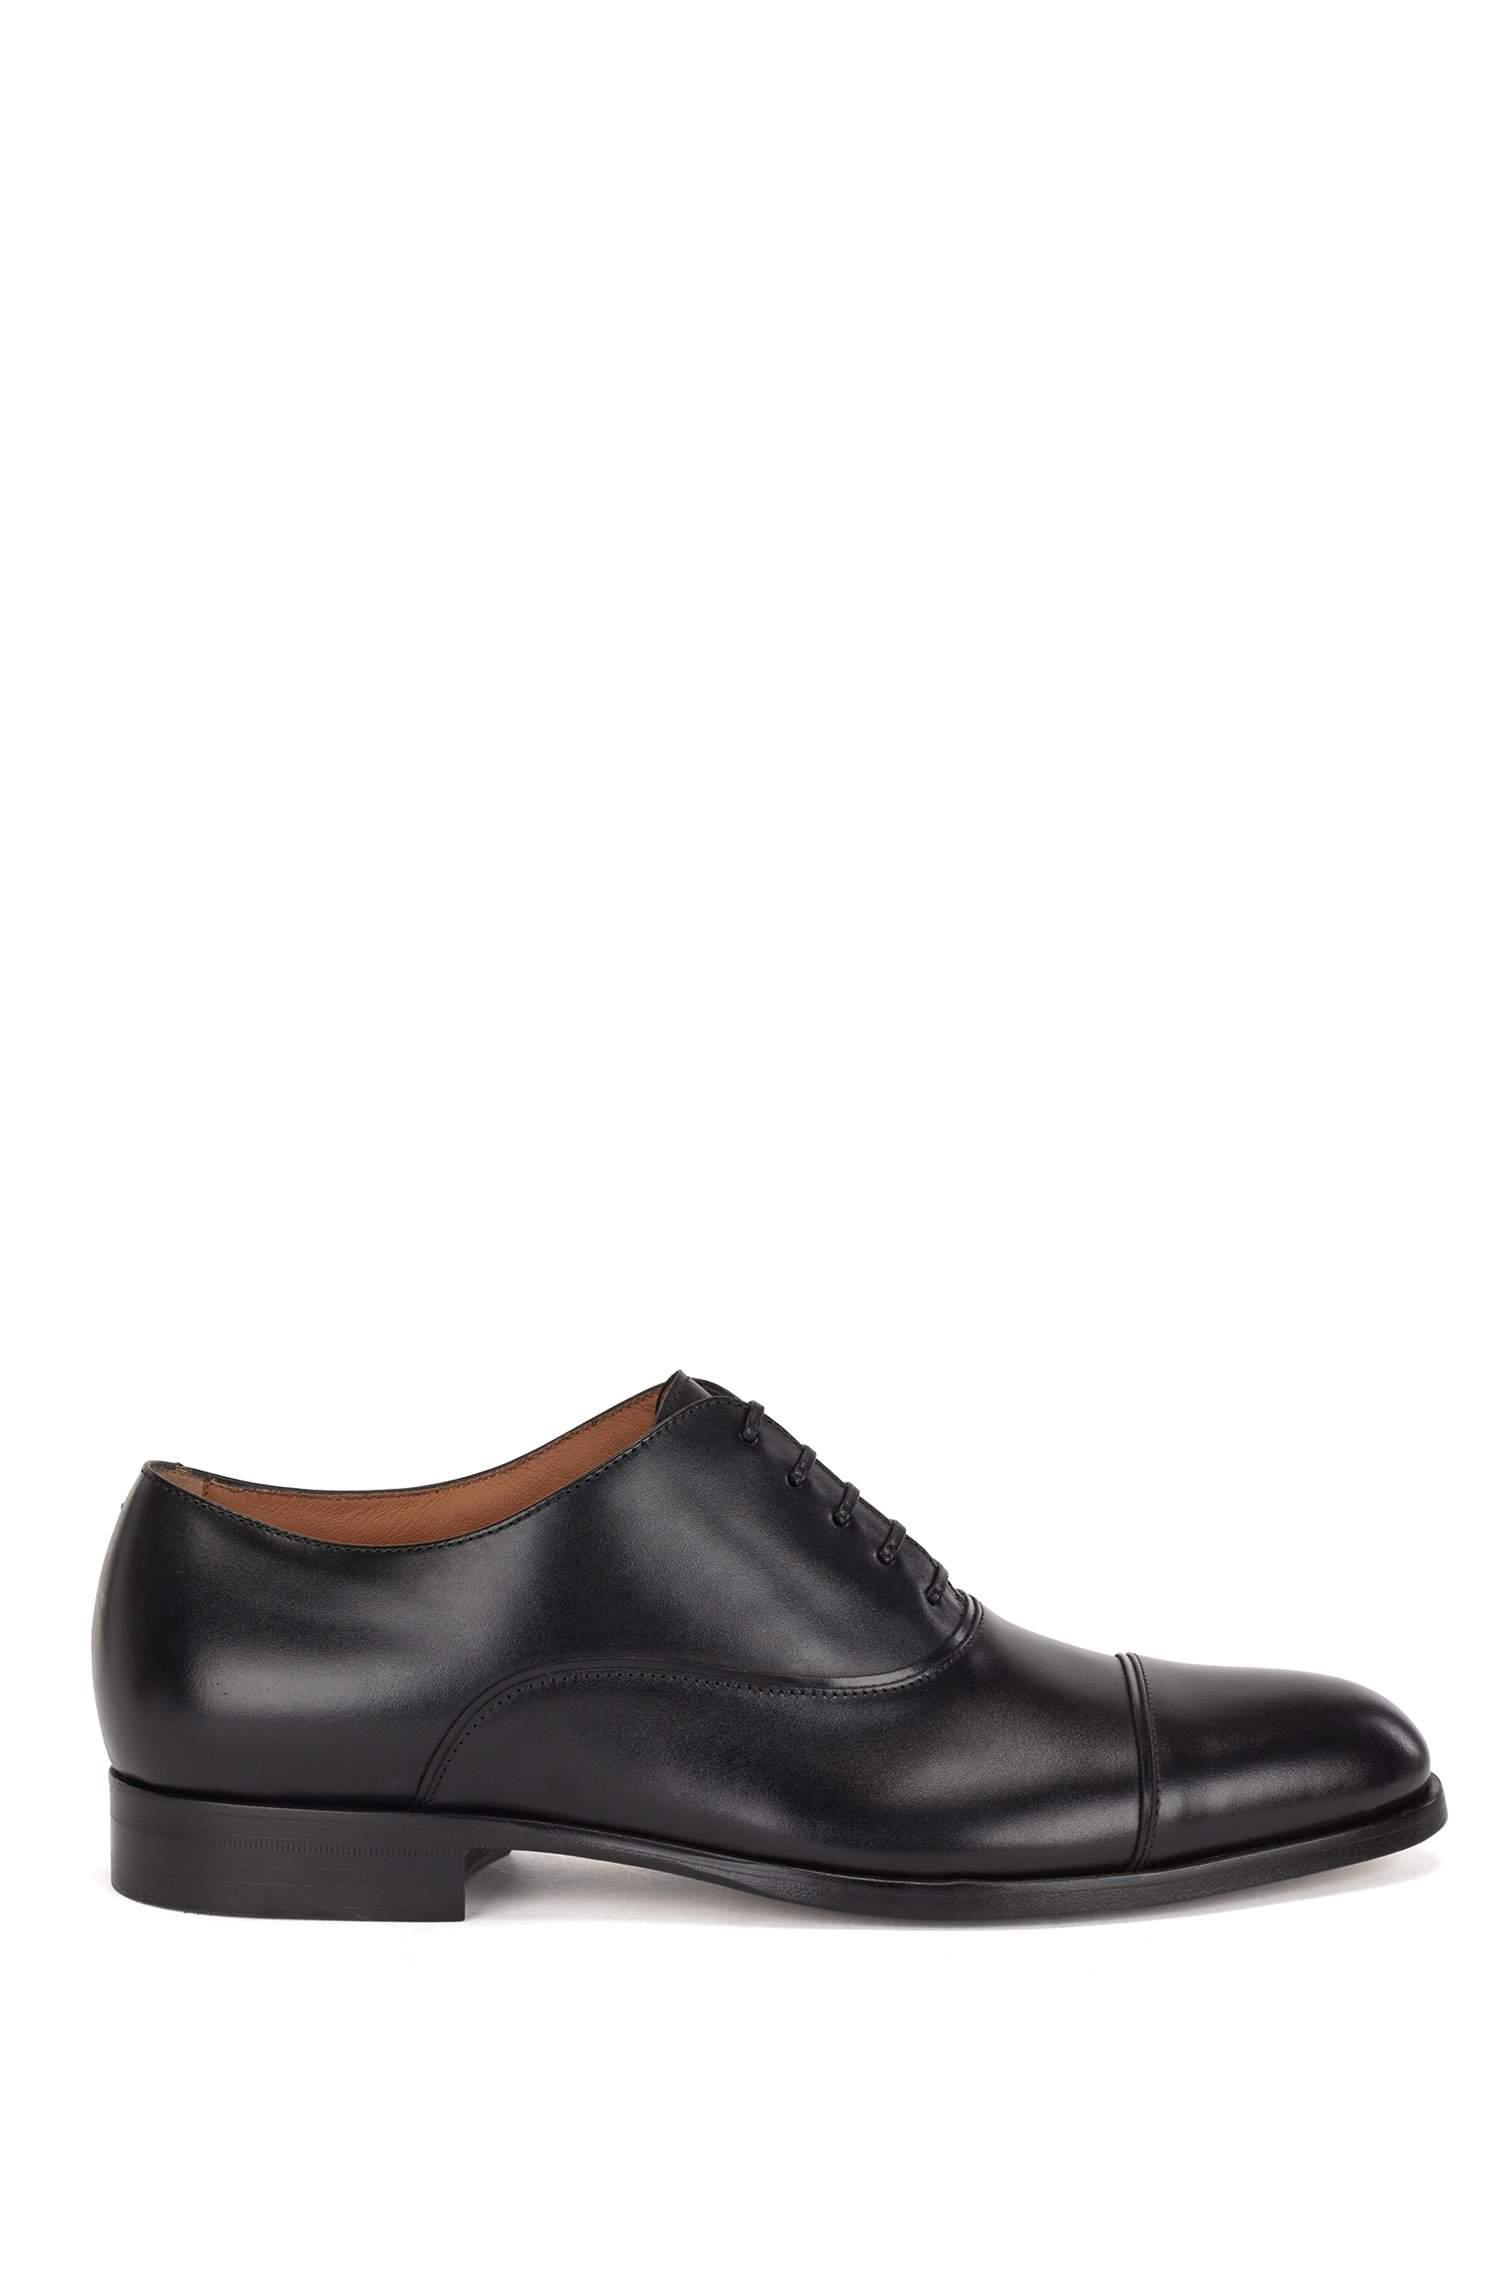 Italian-made cap-toe Oxford shoes in calf leather, Black